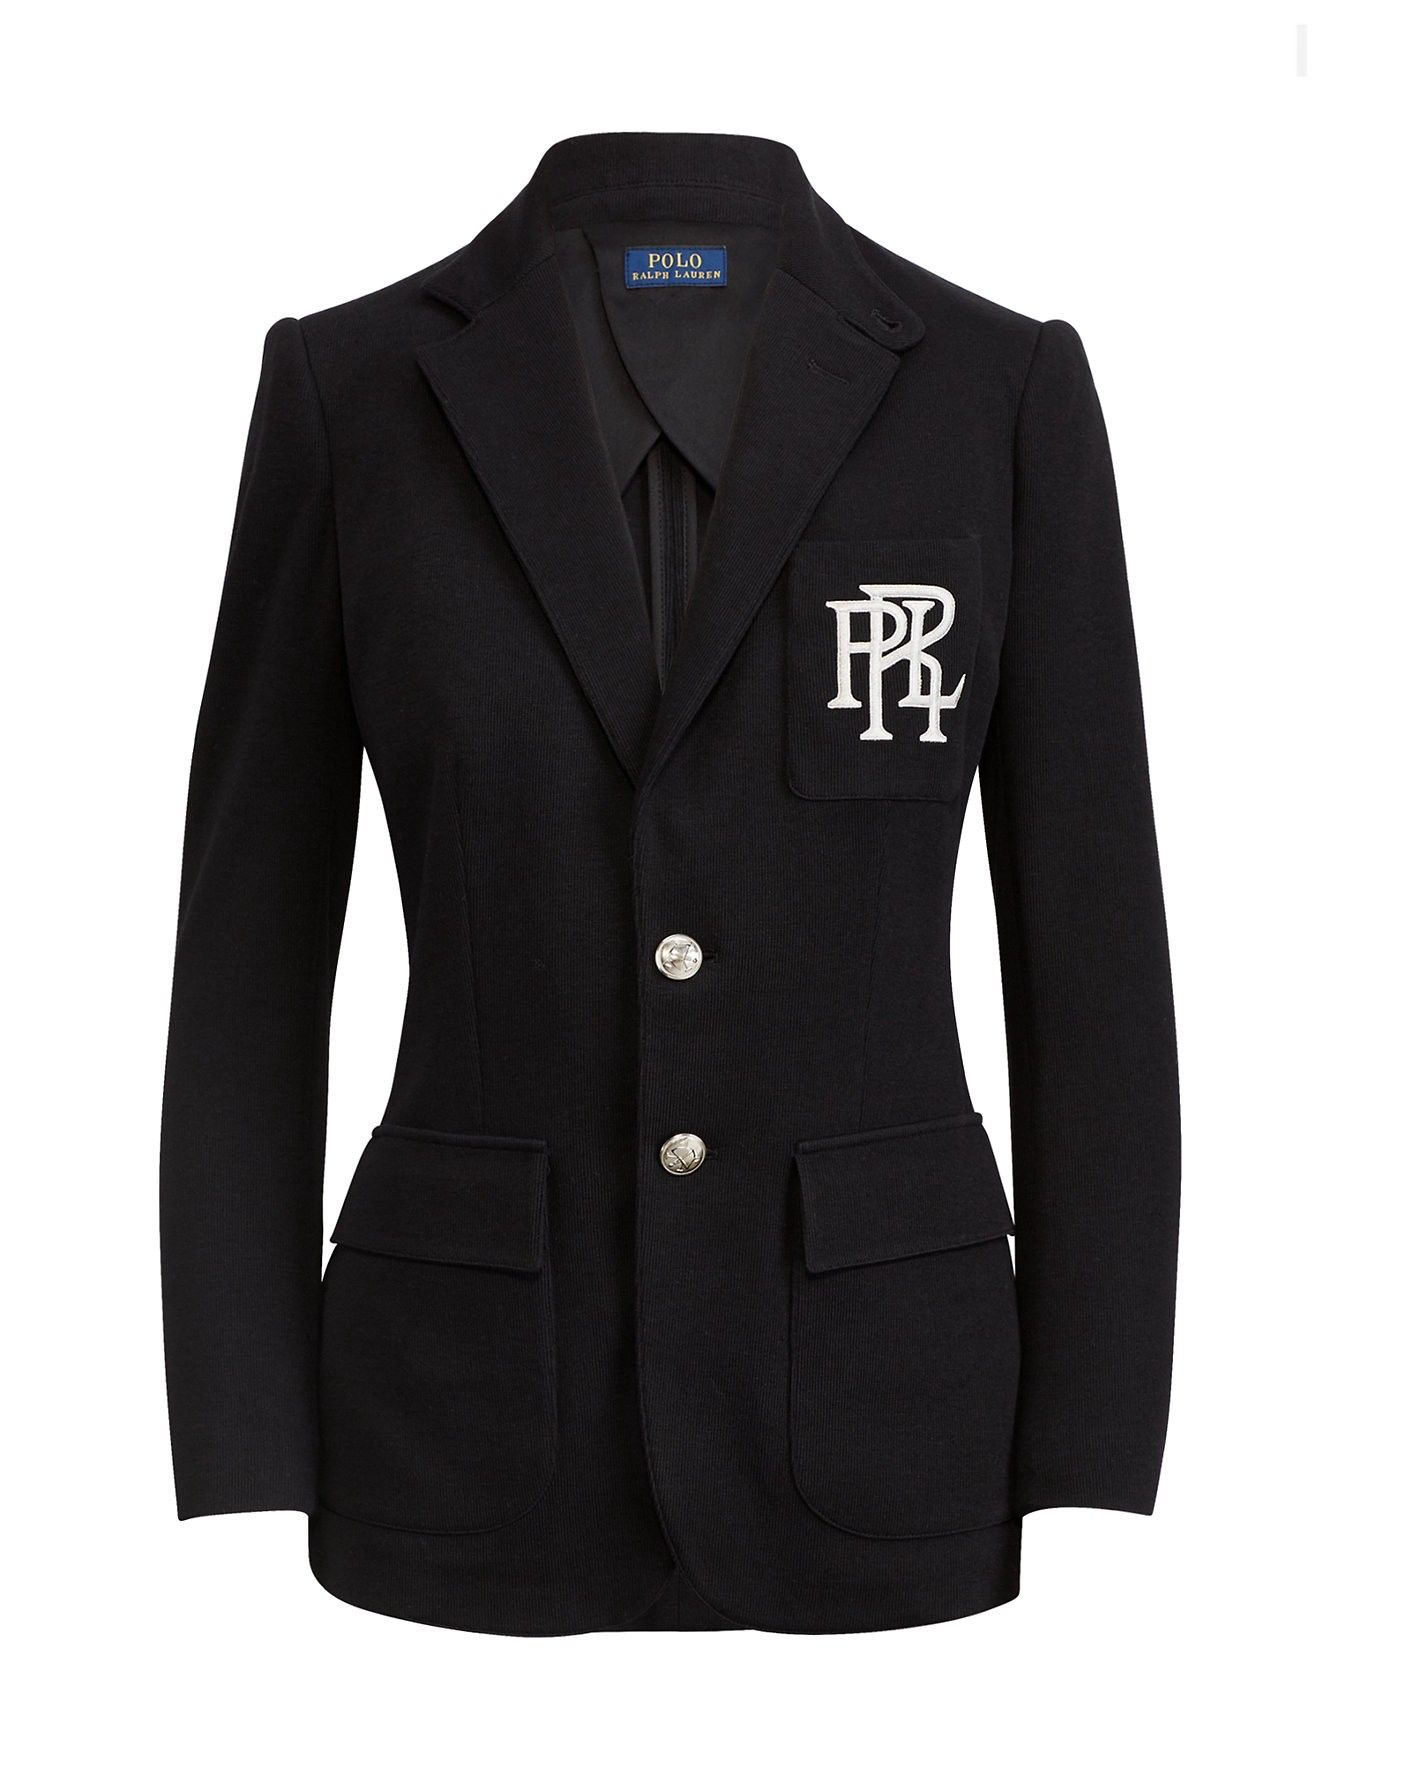 Ralph Lauren Polo Knit Cotton Blazer Modesens In 2020 Blazer Jackets For Women Ralph Lauren Blazer Cotton Blazer